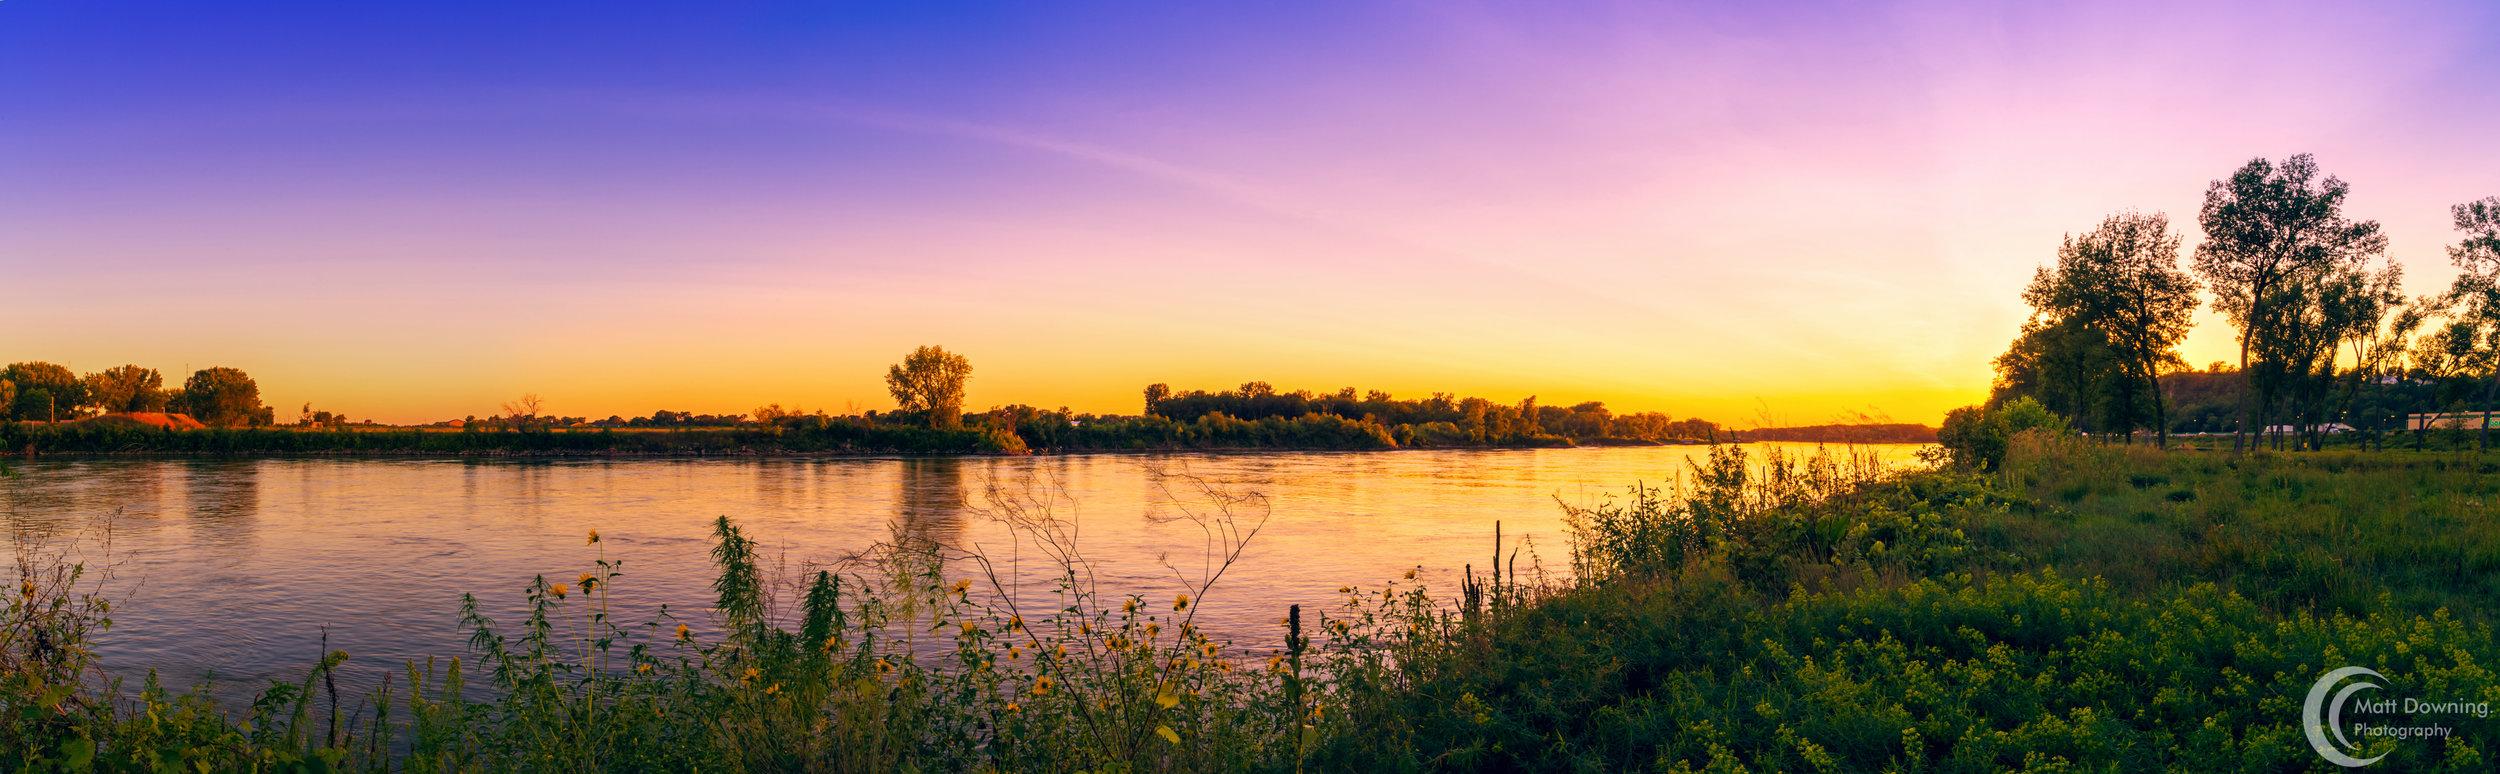 river pano 8.jpg